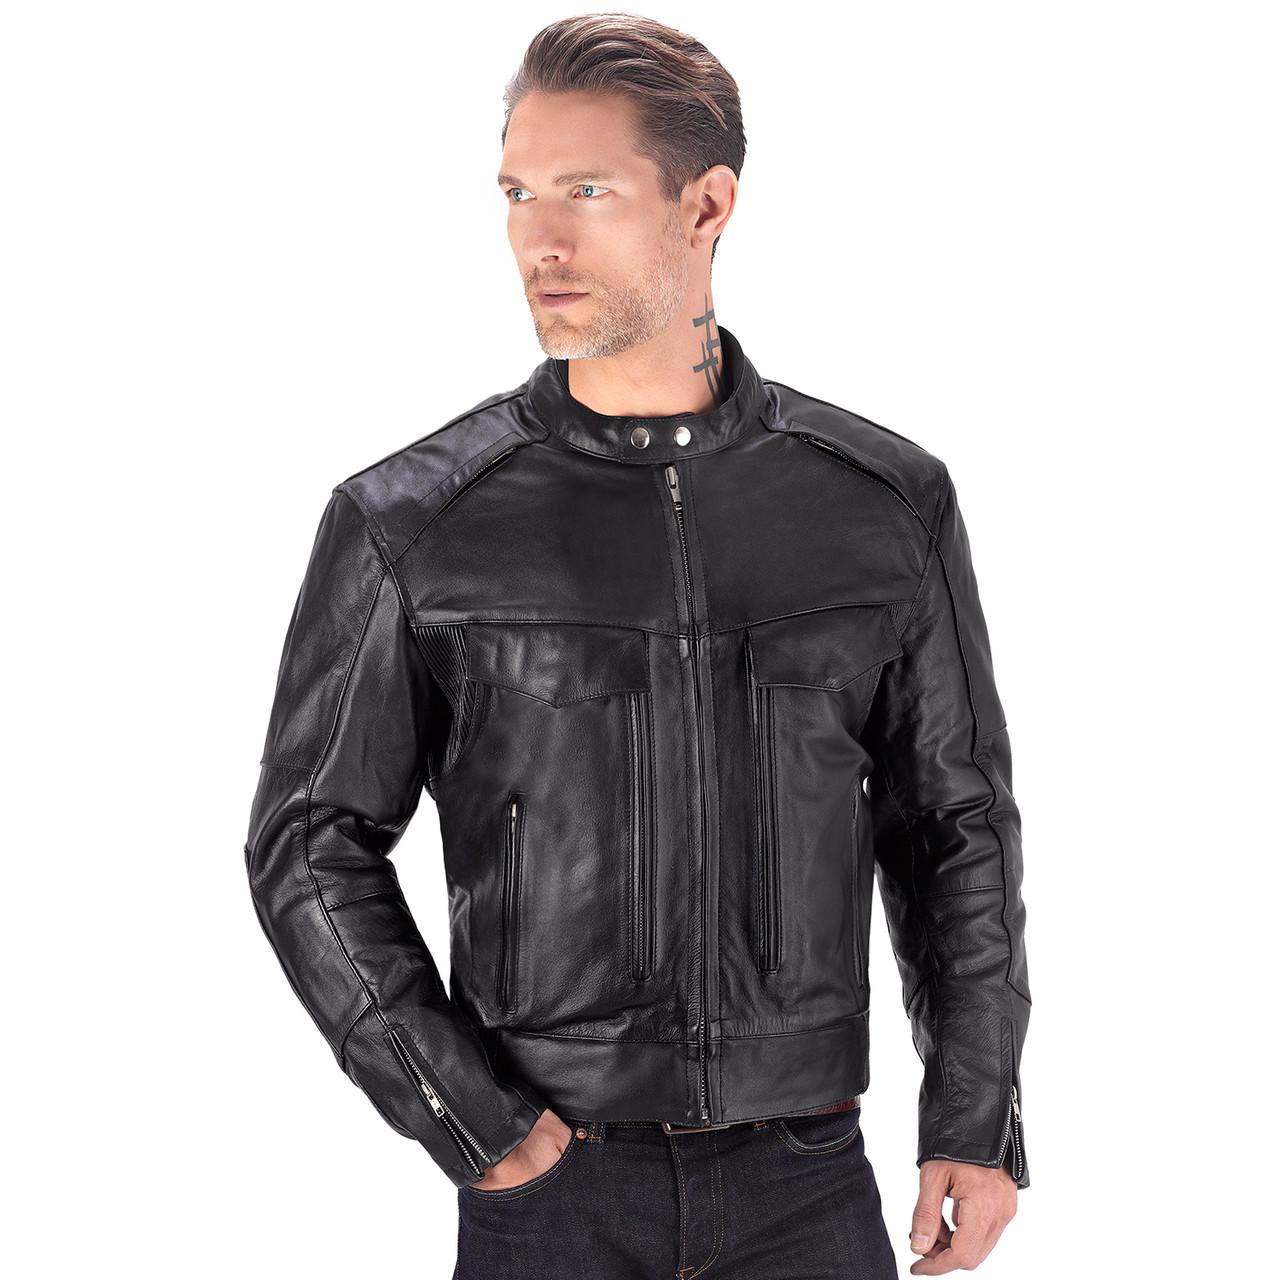 ed197b0d91e Viking Cycle Skeid Black Leather Jacket for Men - Motorcycle House